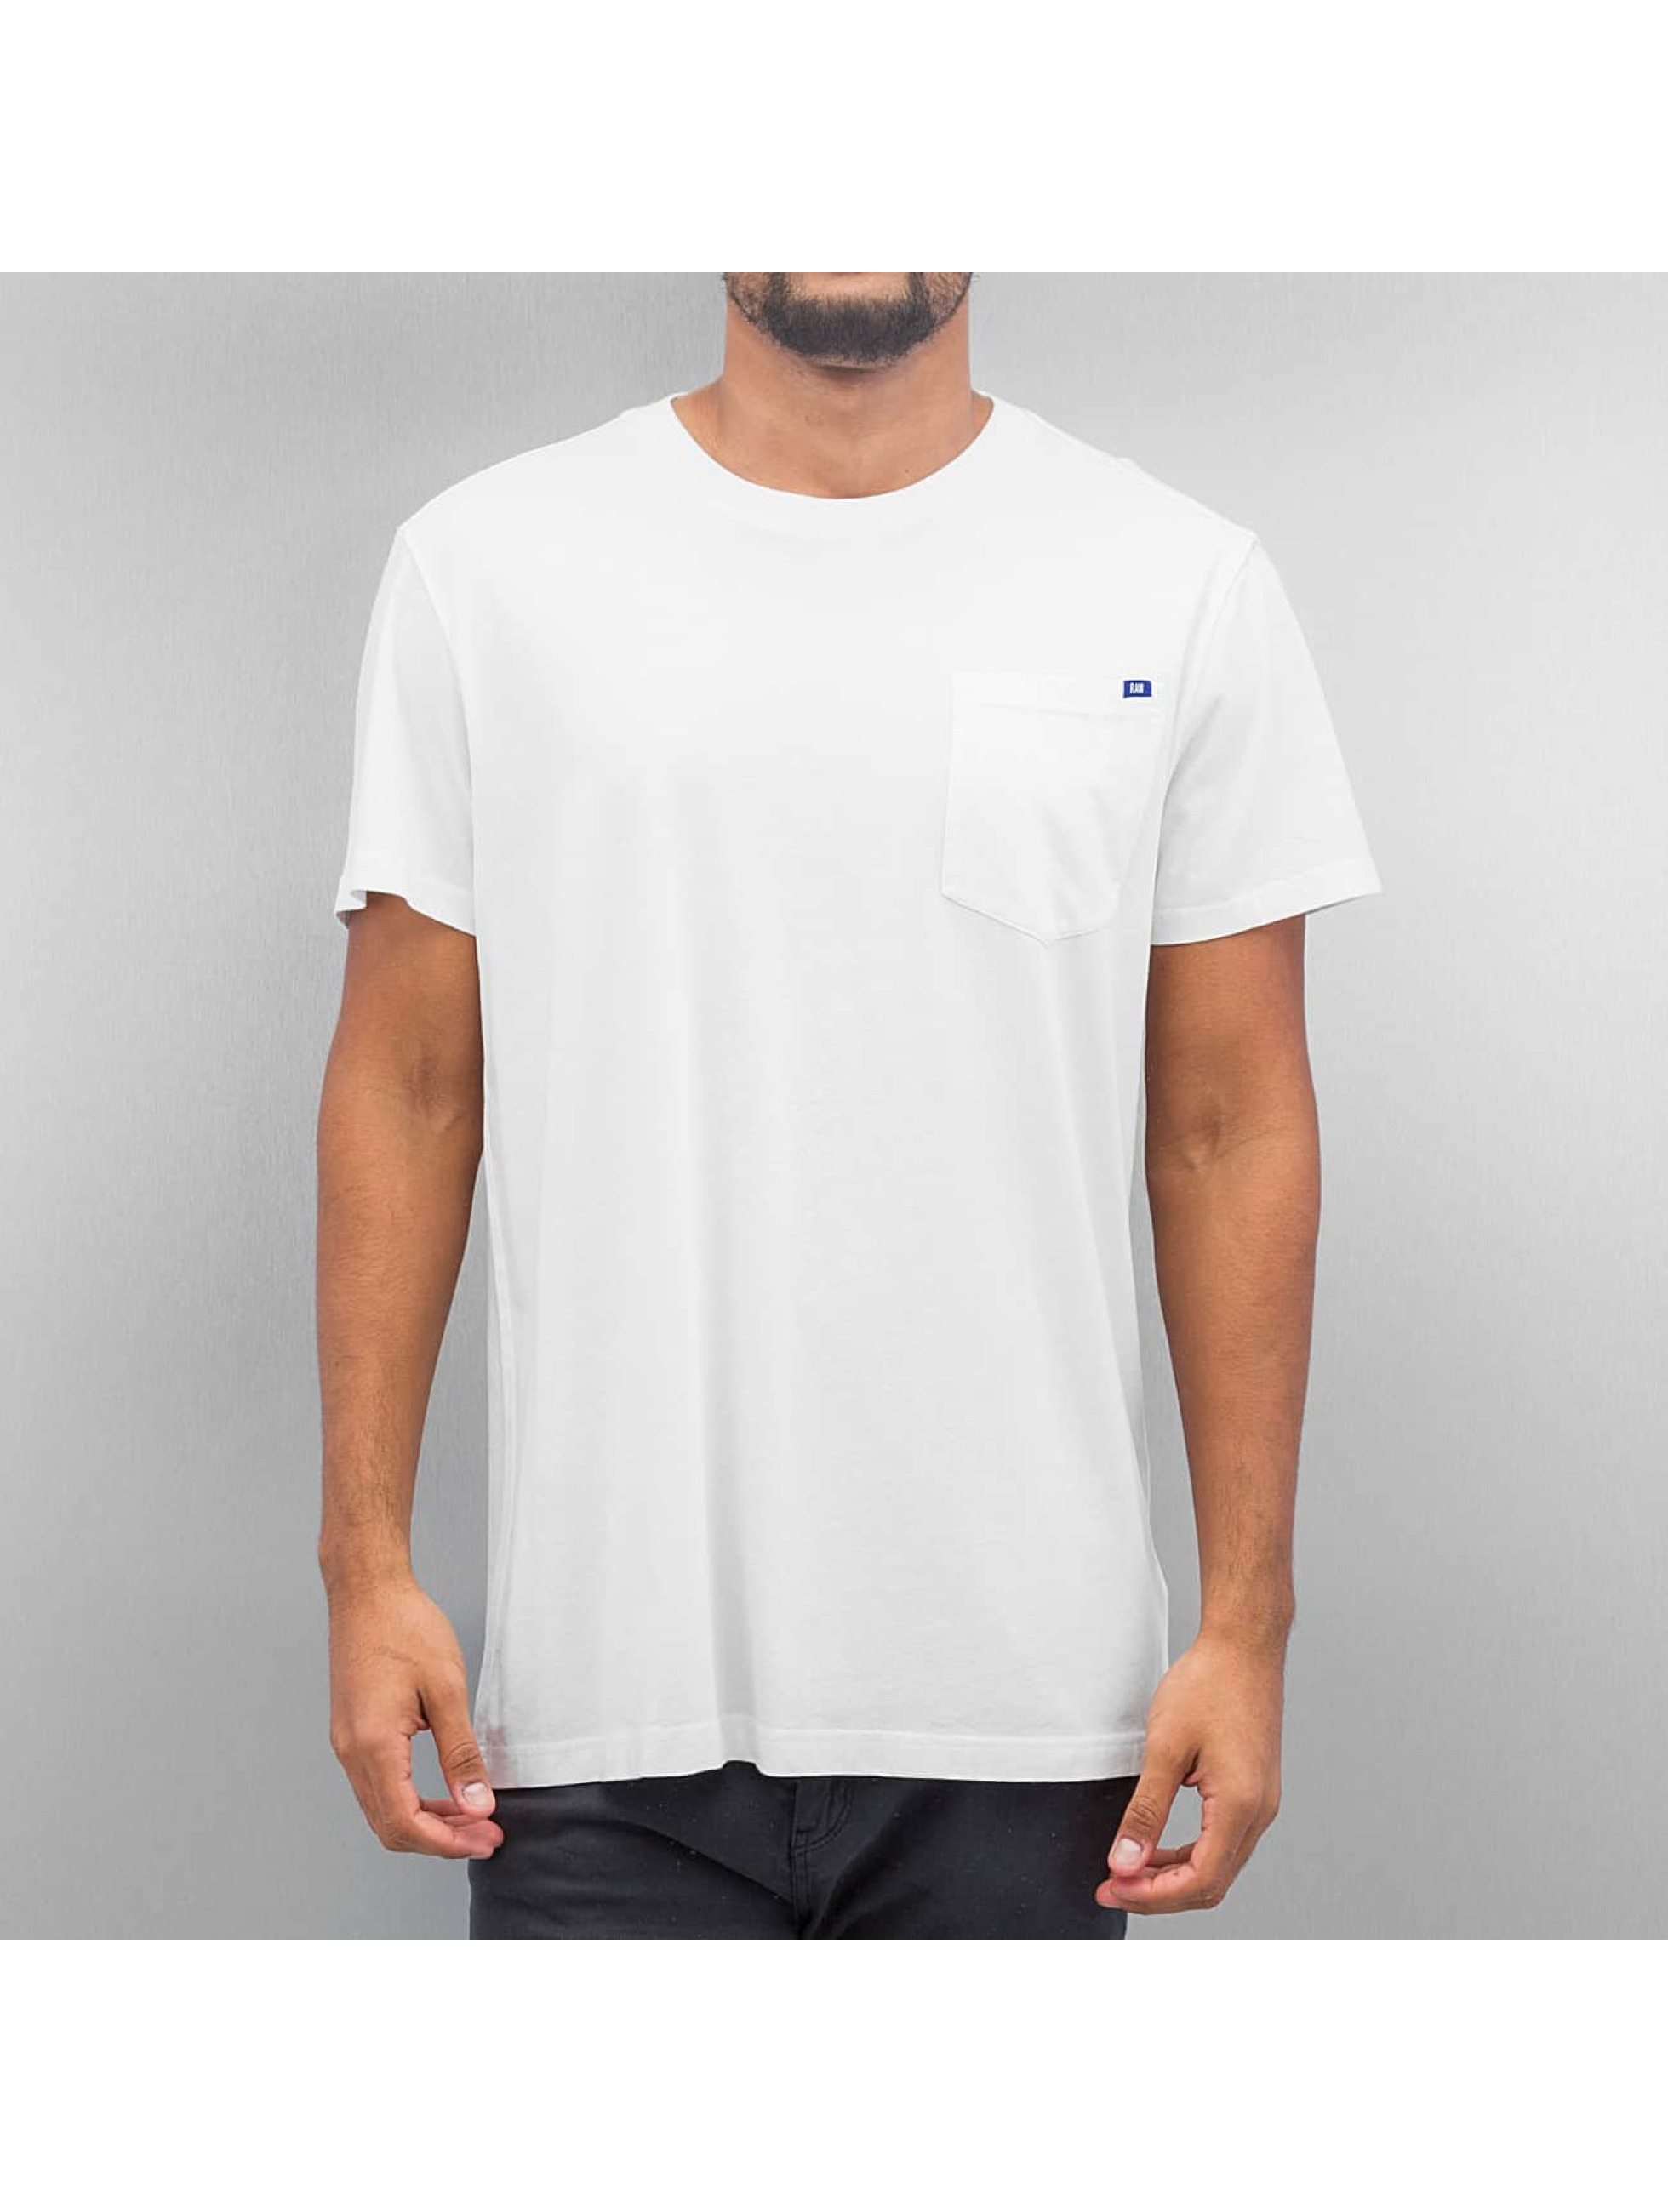 G-Star t-shirt Ratiz Pocket Compact wit